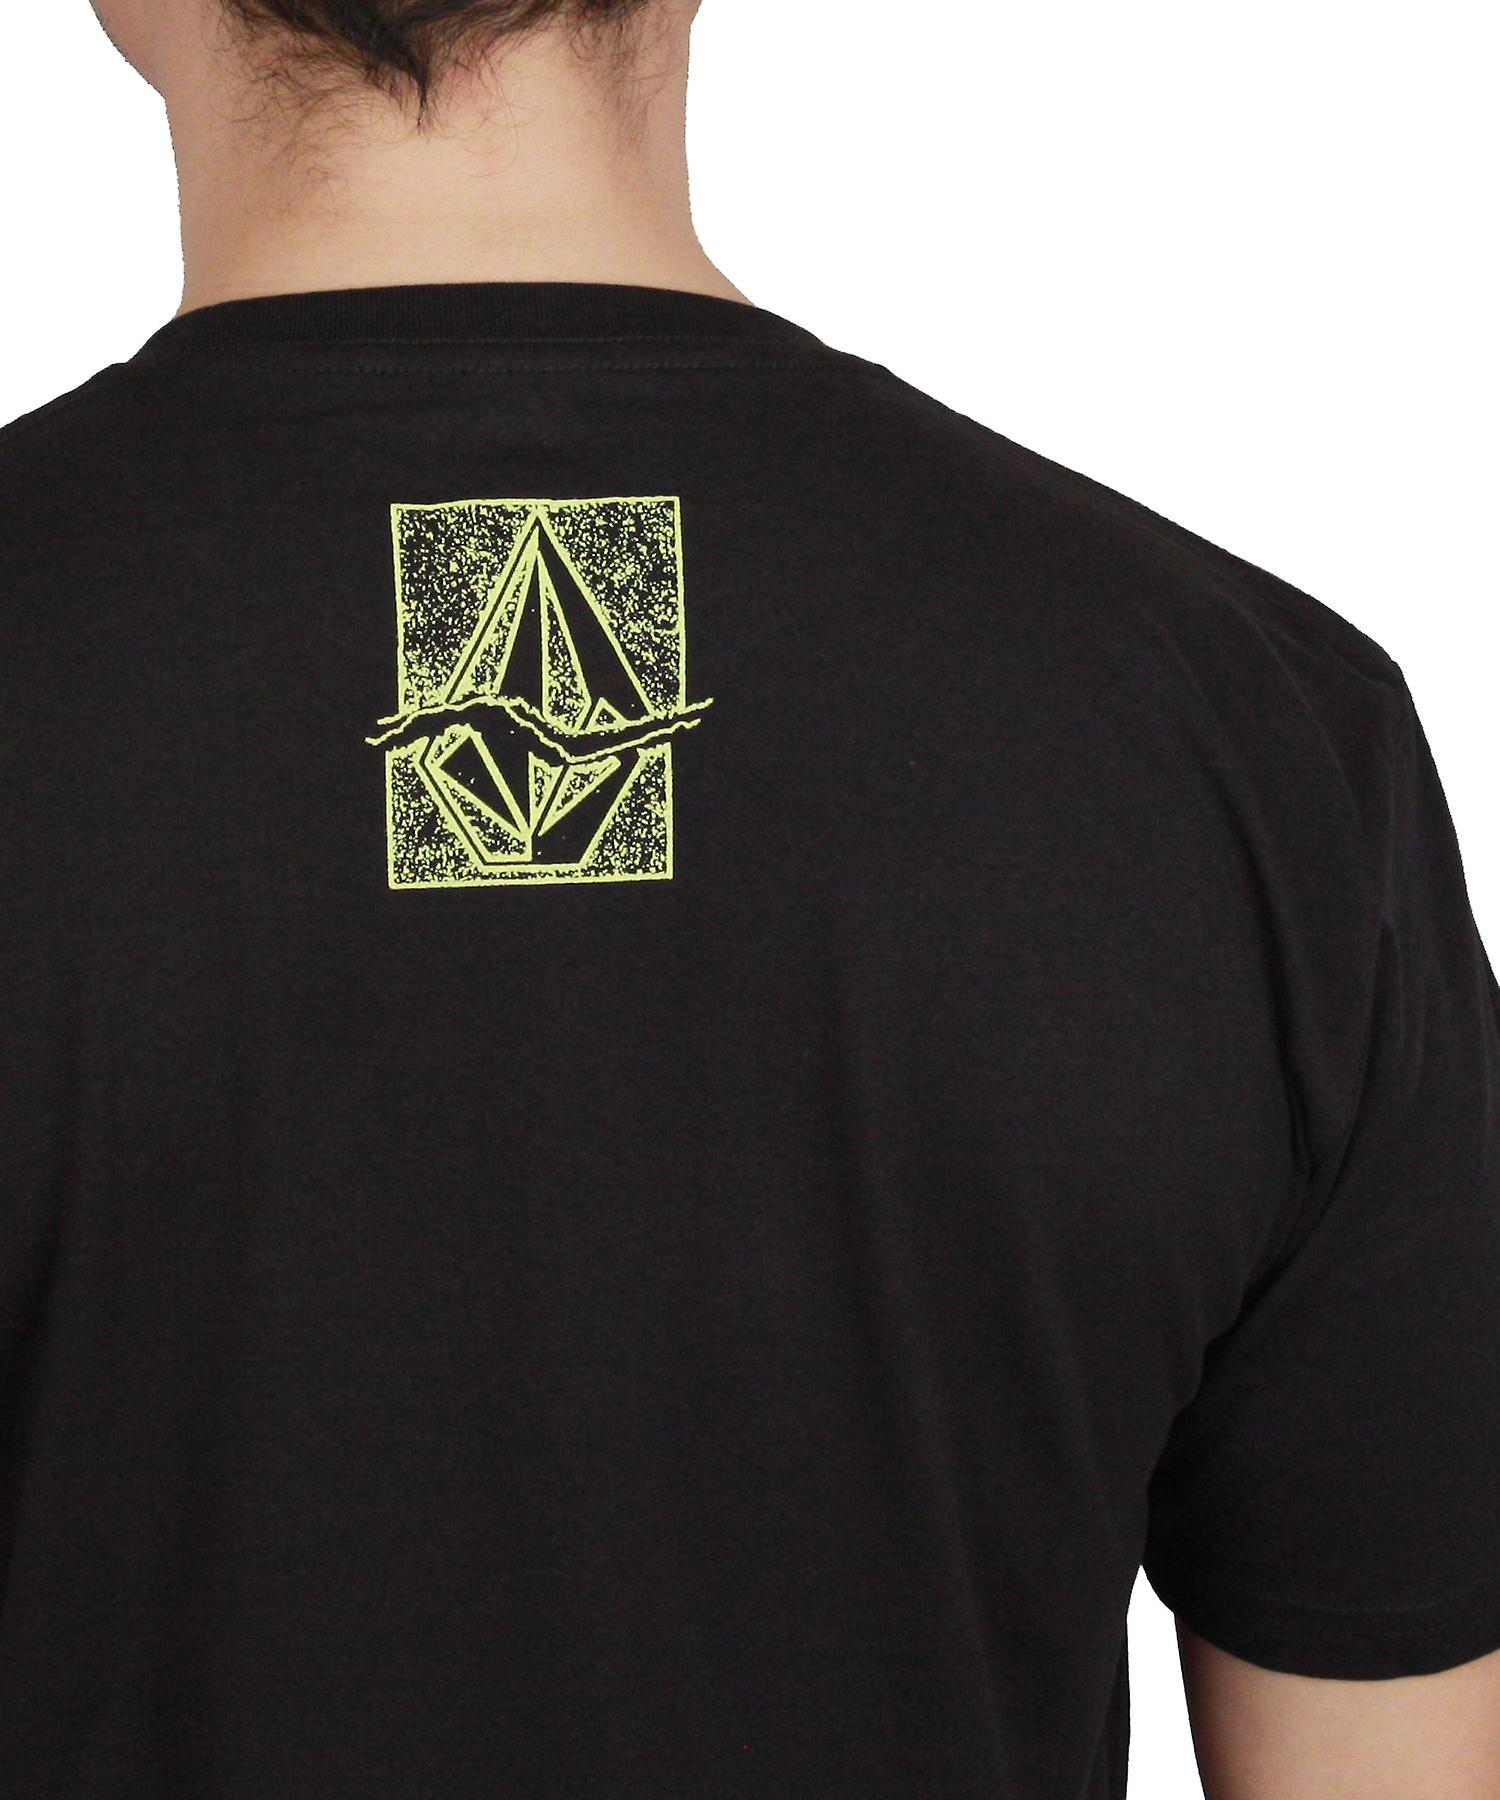 Volcom T-Shirt ~ Edge